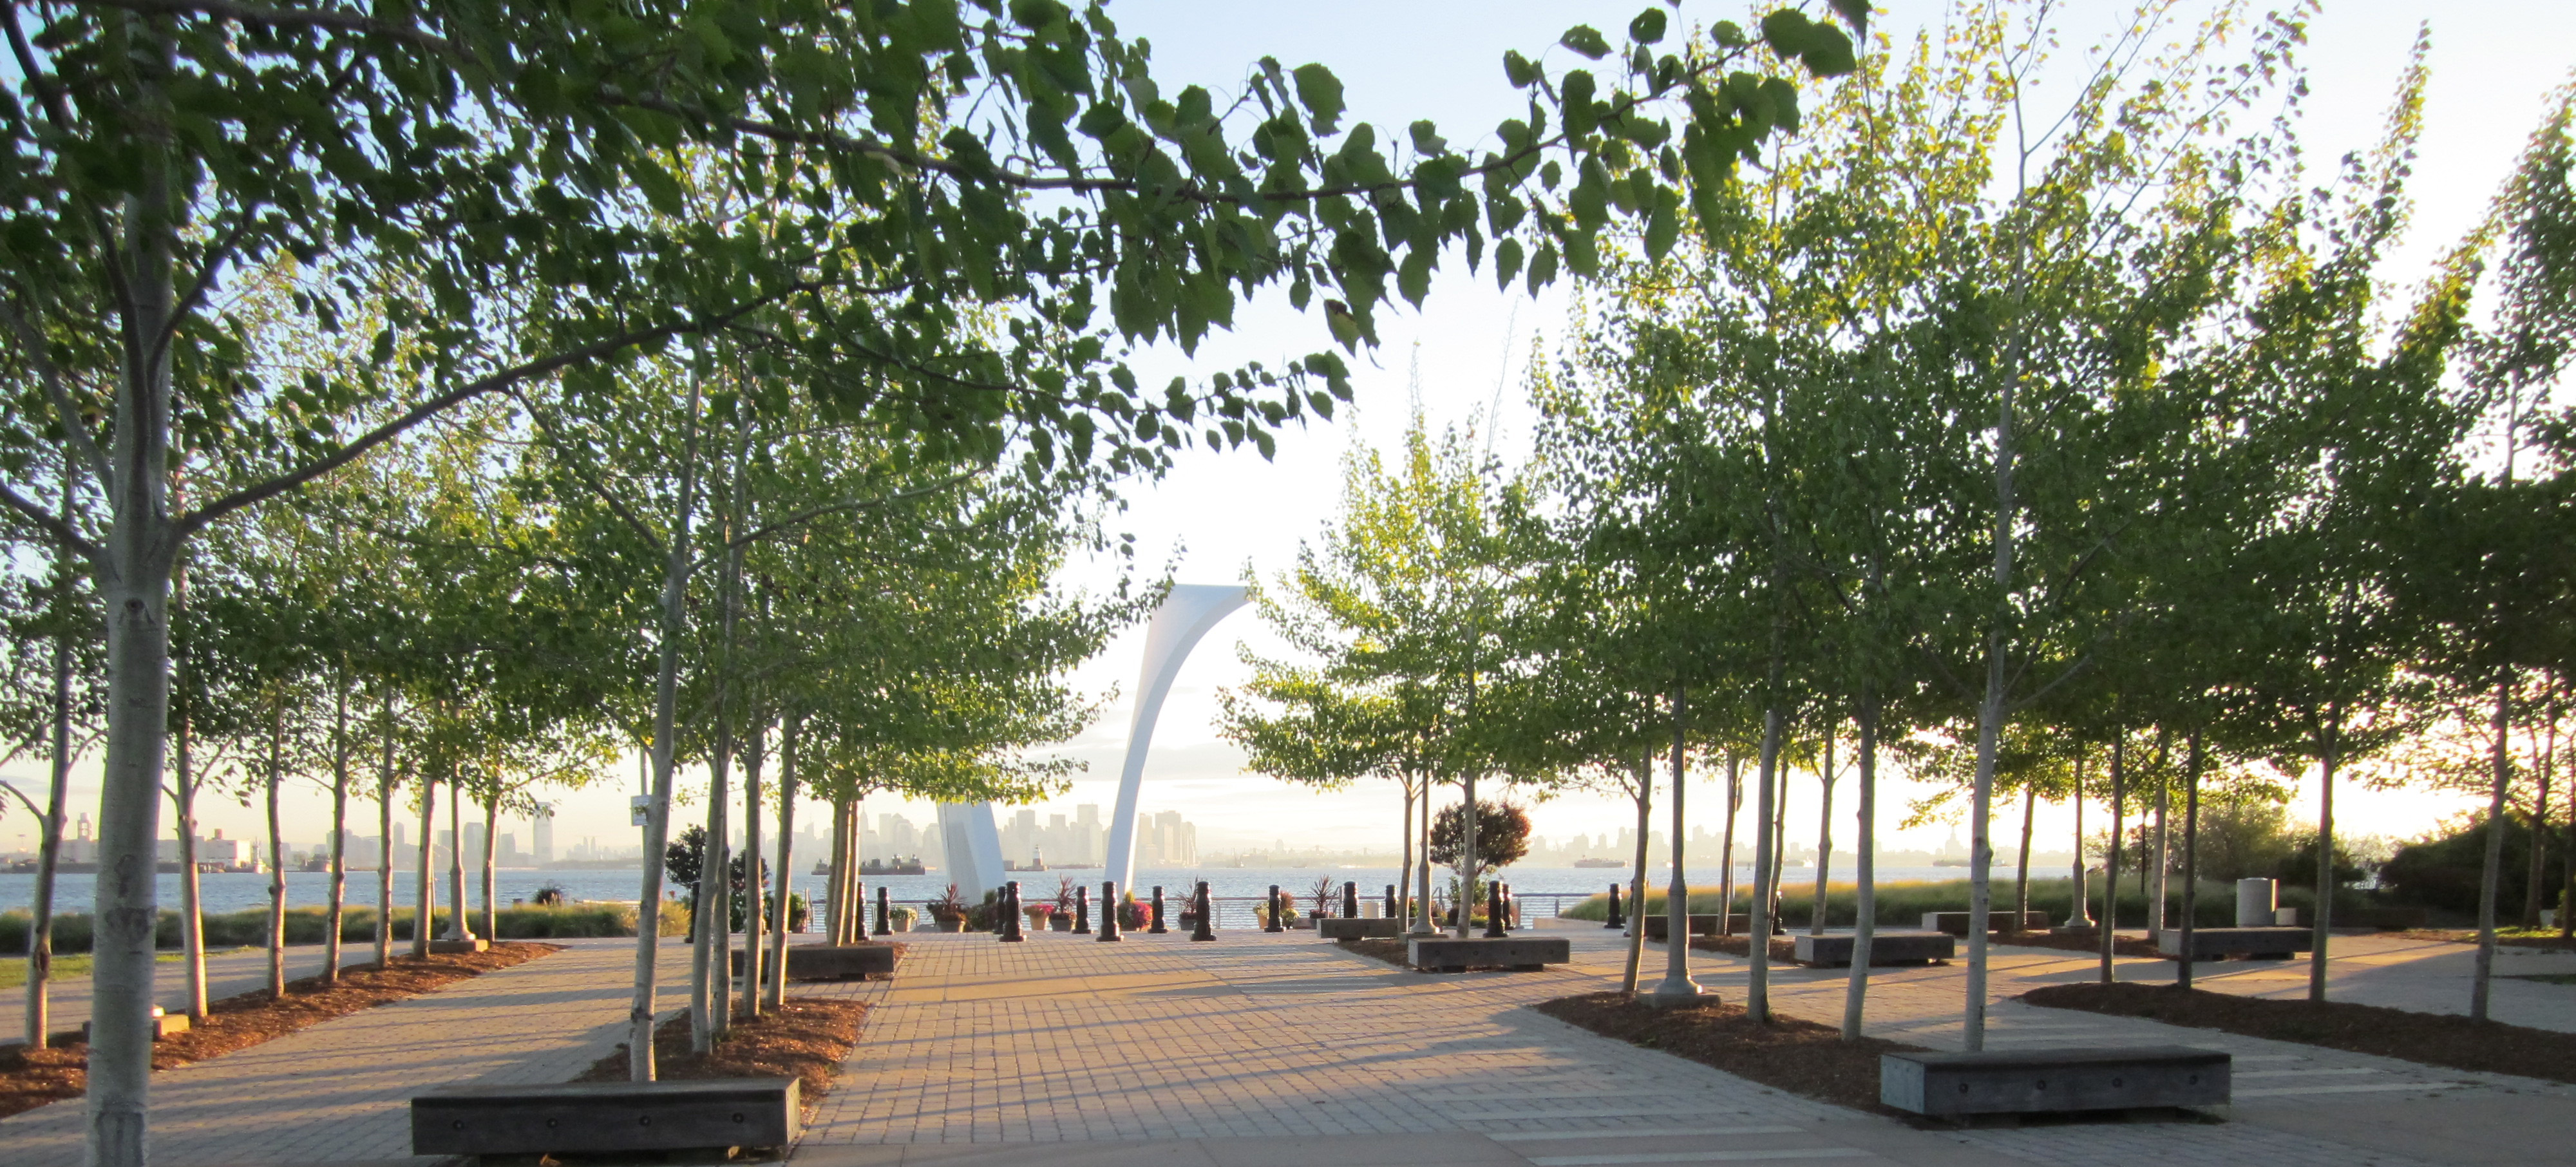 St George Ballpark And Waterfront Park Architect Magazine